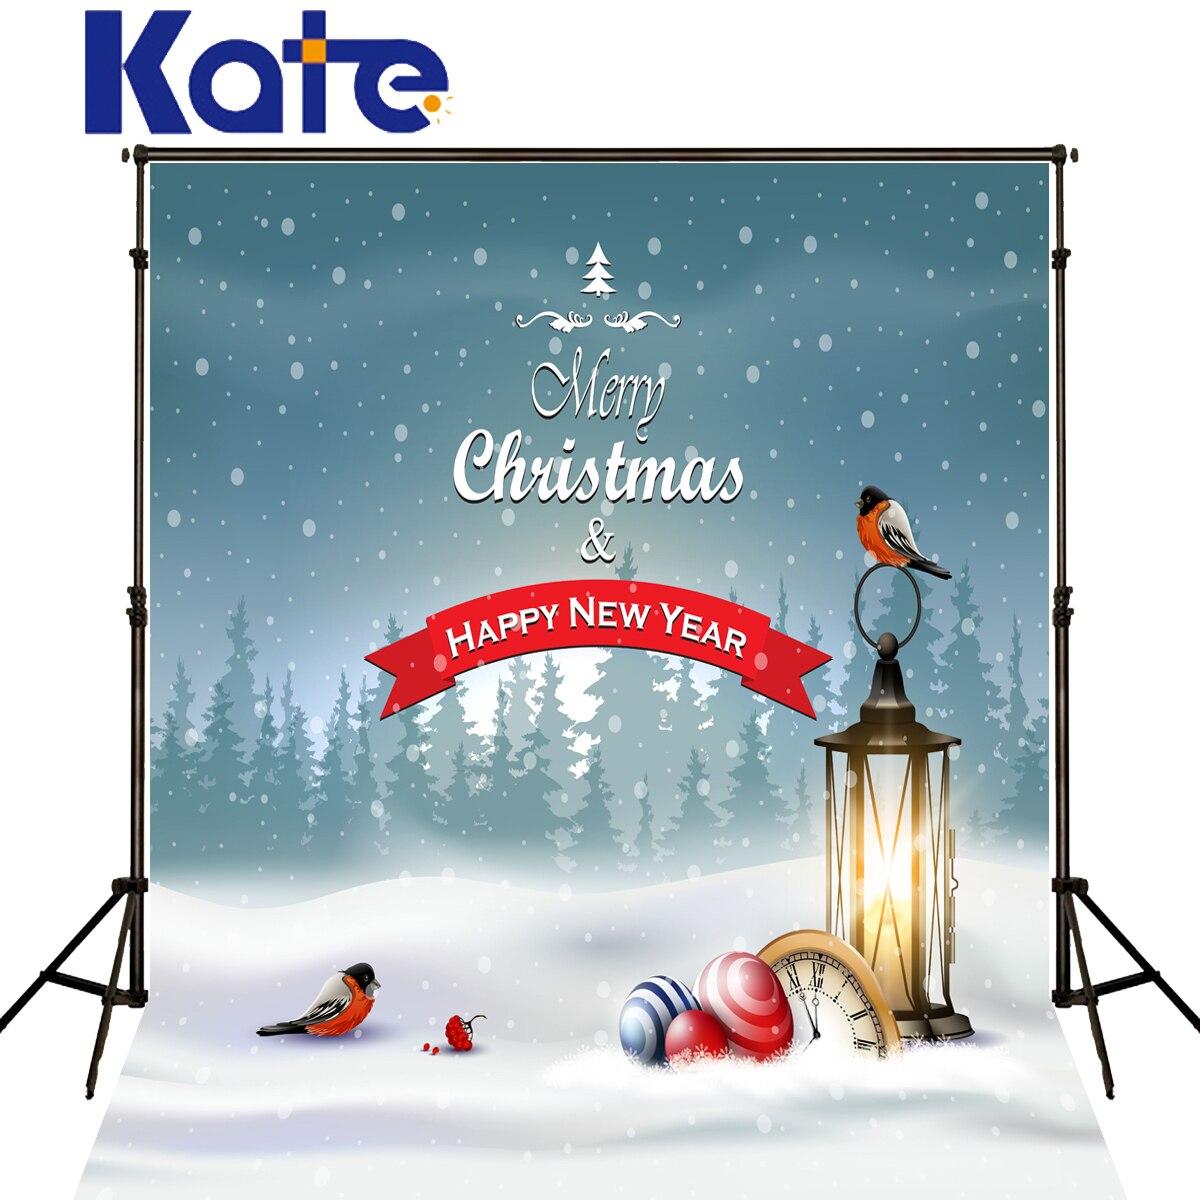 цена Christmas Backgrounds Birds Light Balls Picture Trees Watch Backgrounds For The Photography Studio Kate онлайн в 2017 году